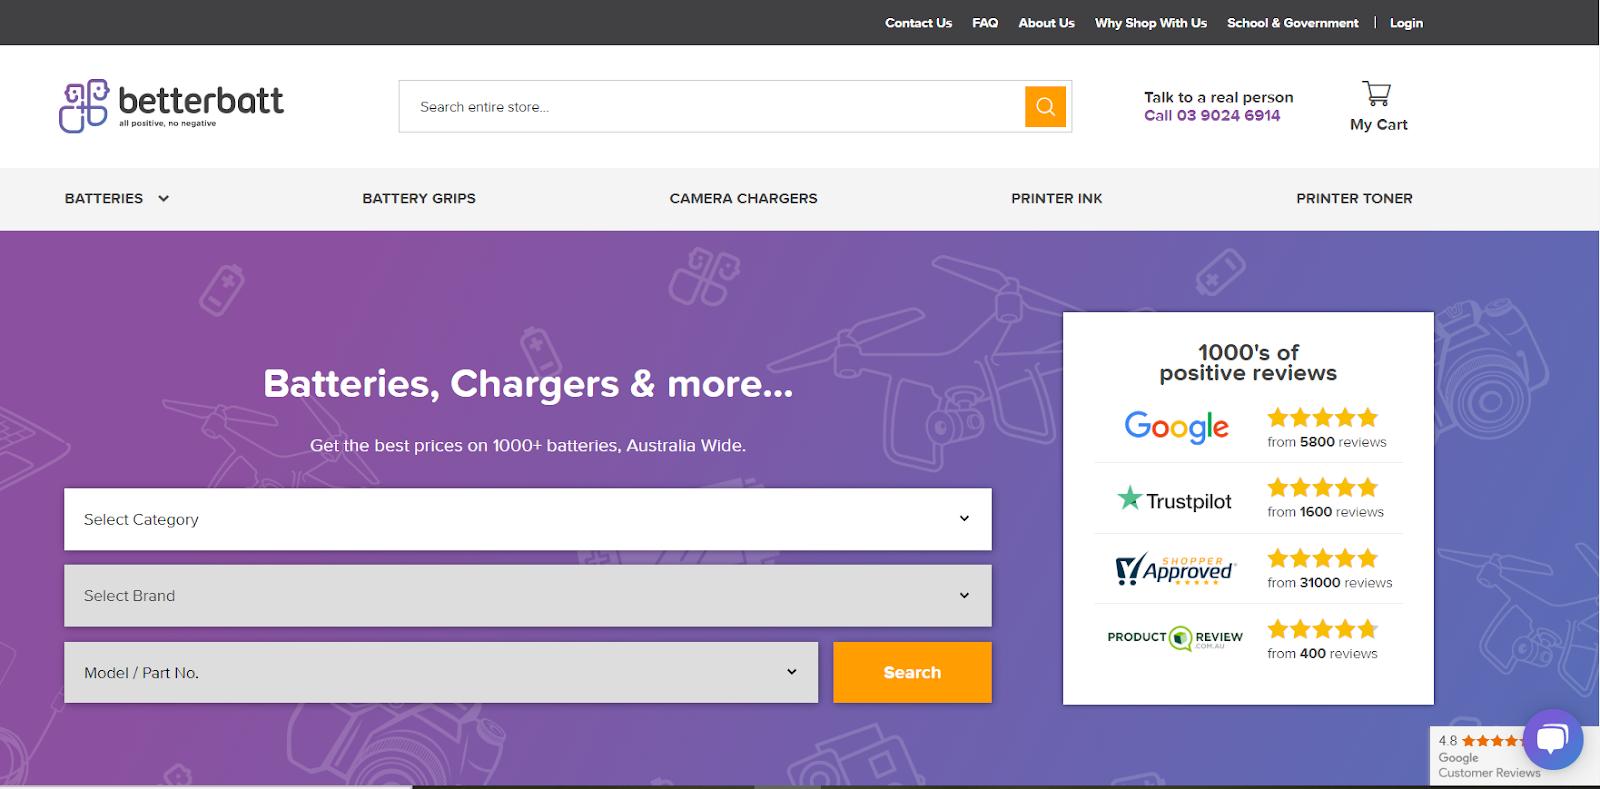 BetterBatt Magento 2 store using One Step Checkout